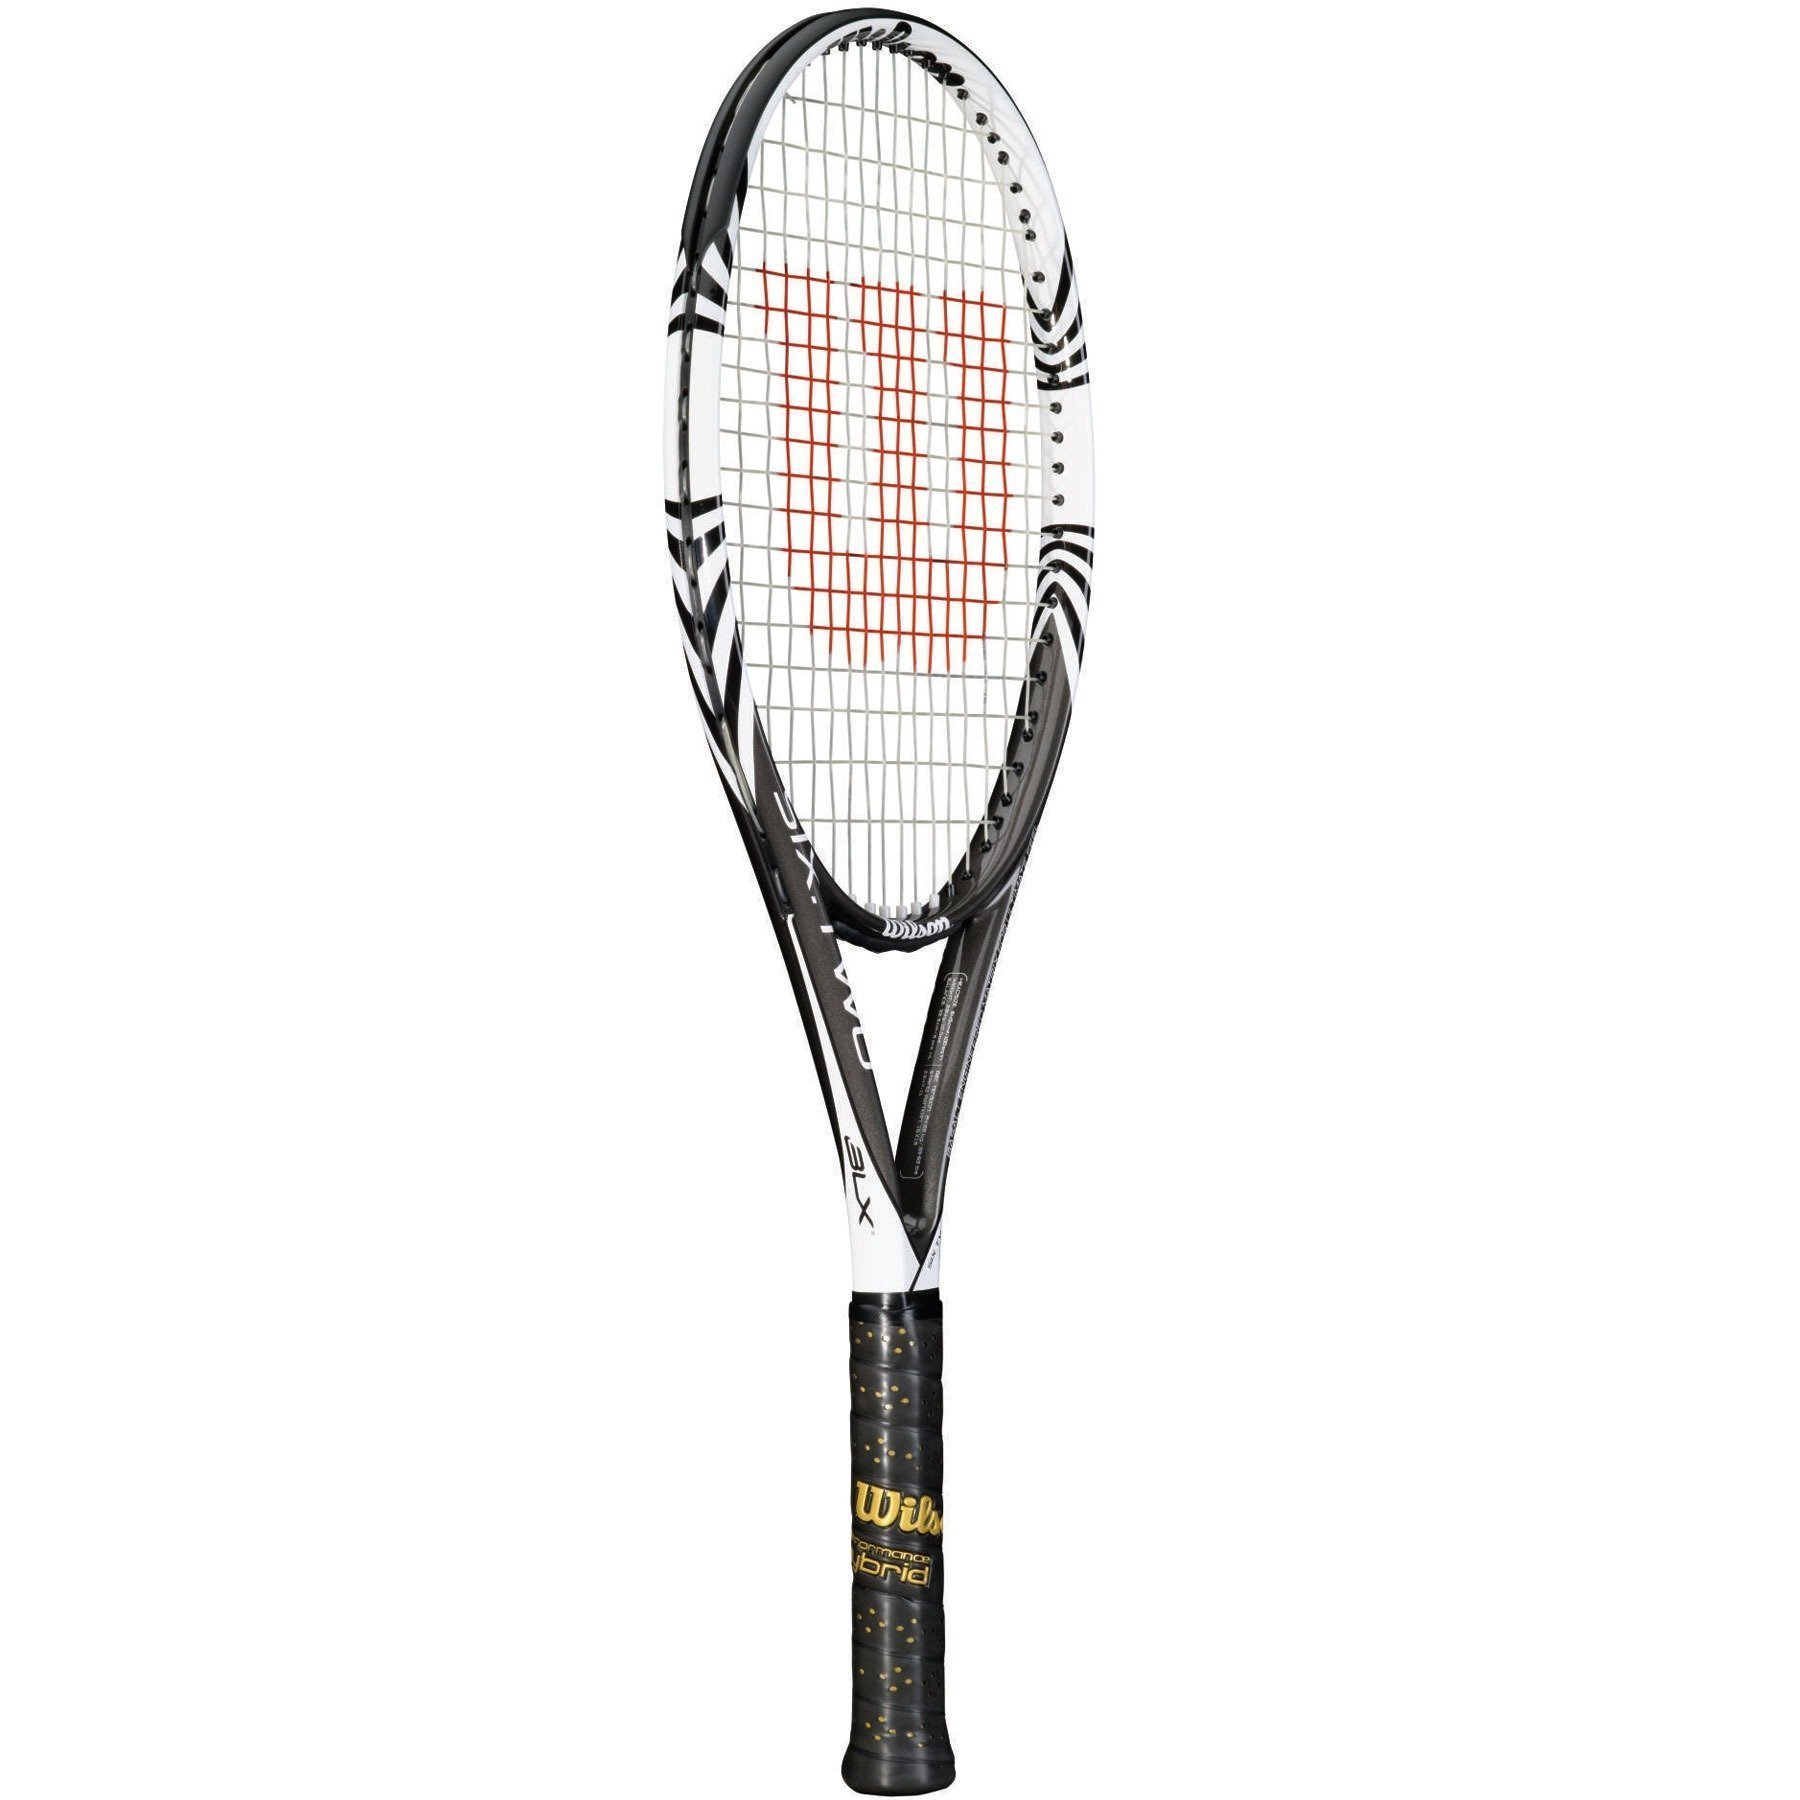 Wilson tennis Wilson six two blx 100 tennisketcher fra billigsport24